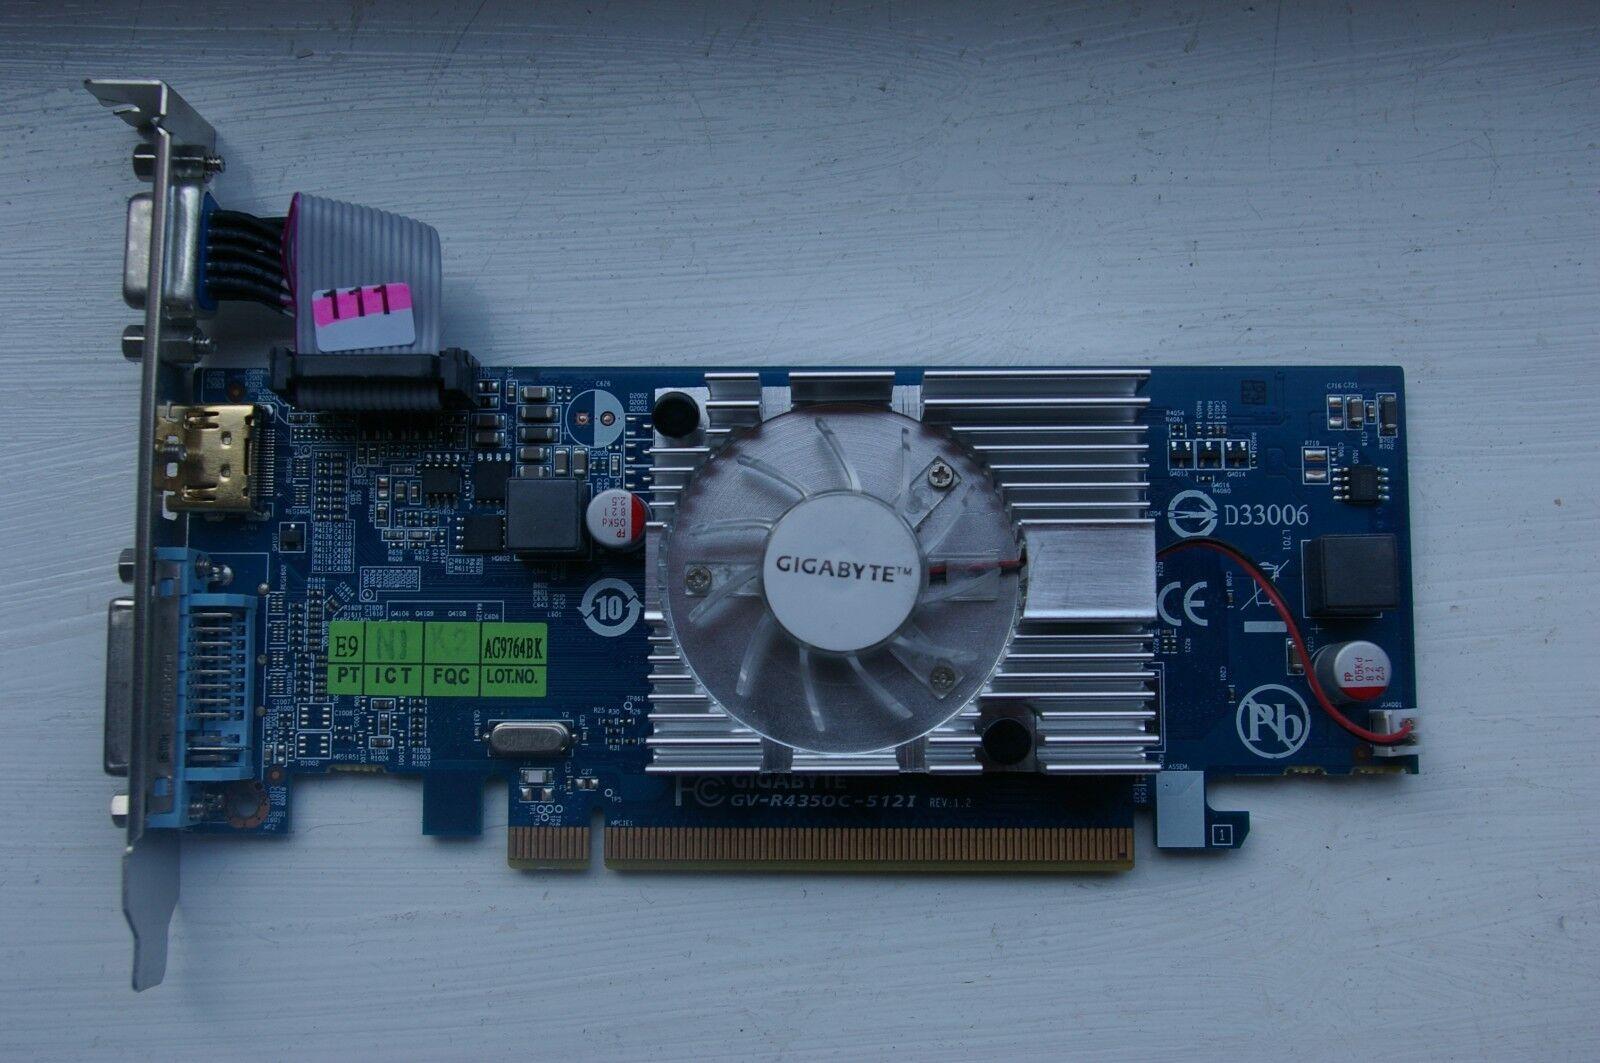 GIGABYTE ATI RADEON HD4345 RV710 PCI-EX16 512 MB HDMI/DVI/VGA